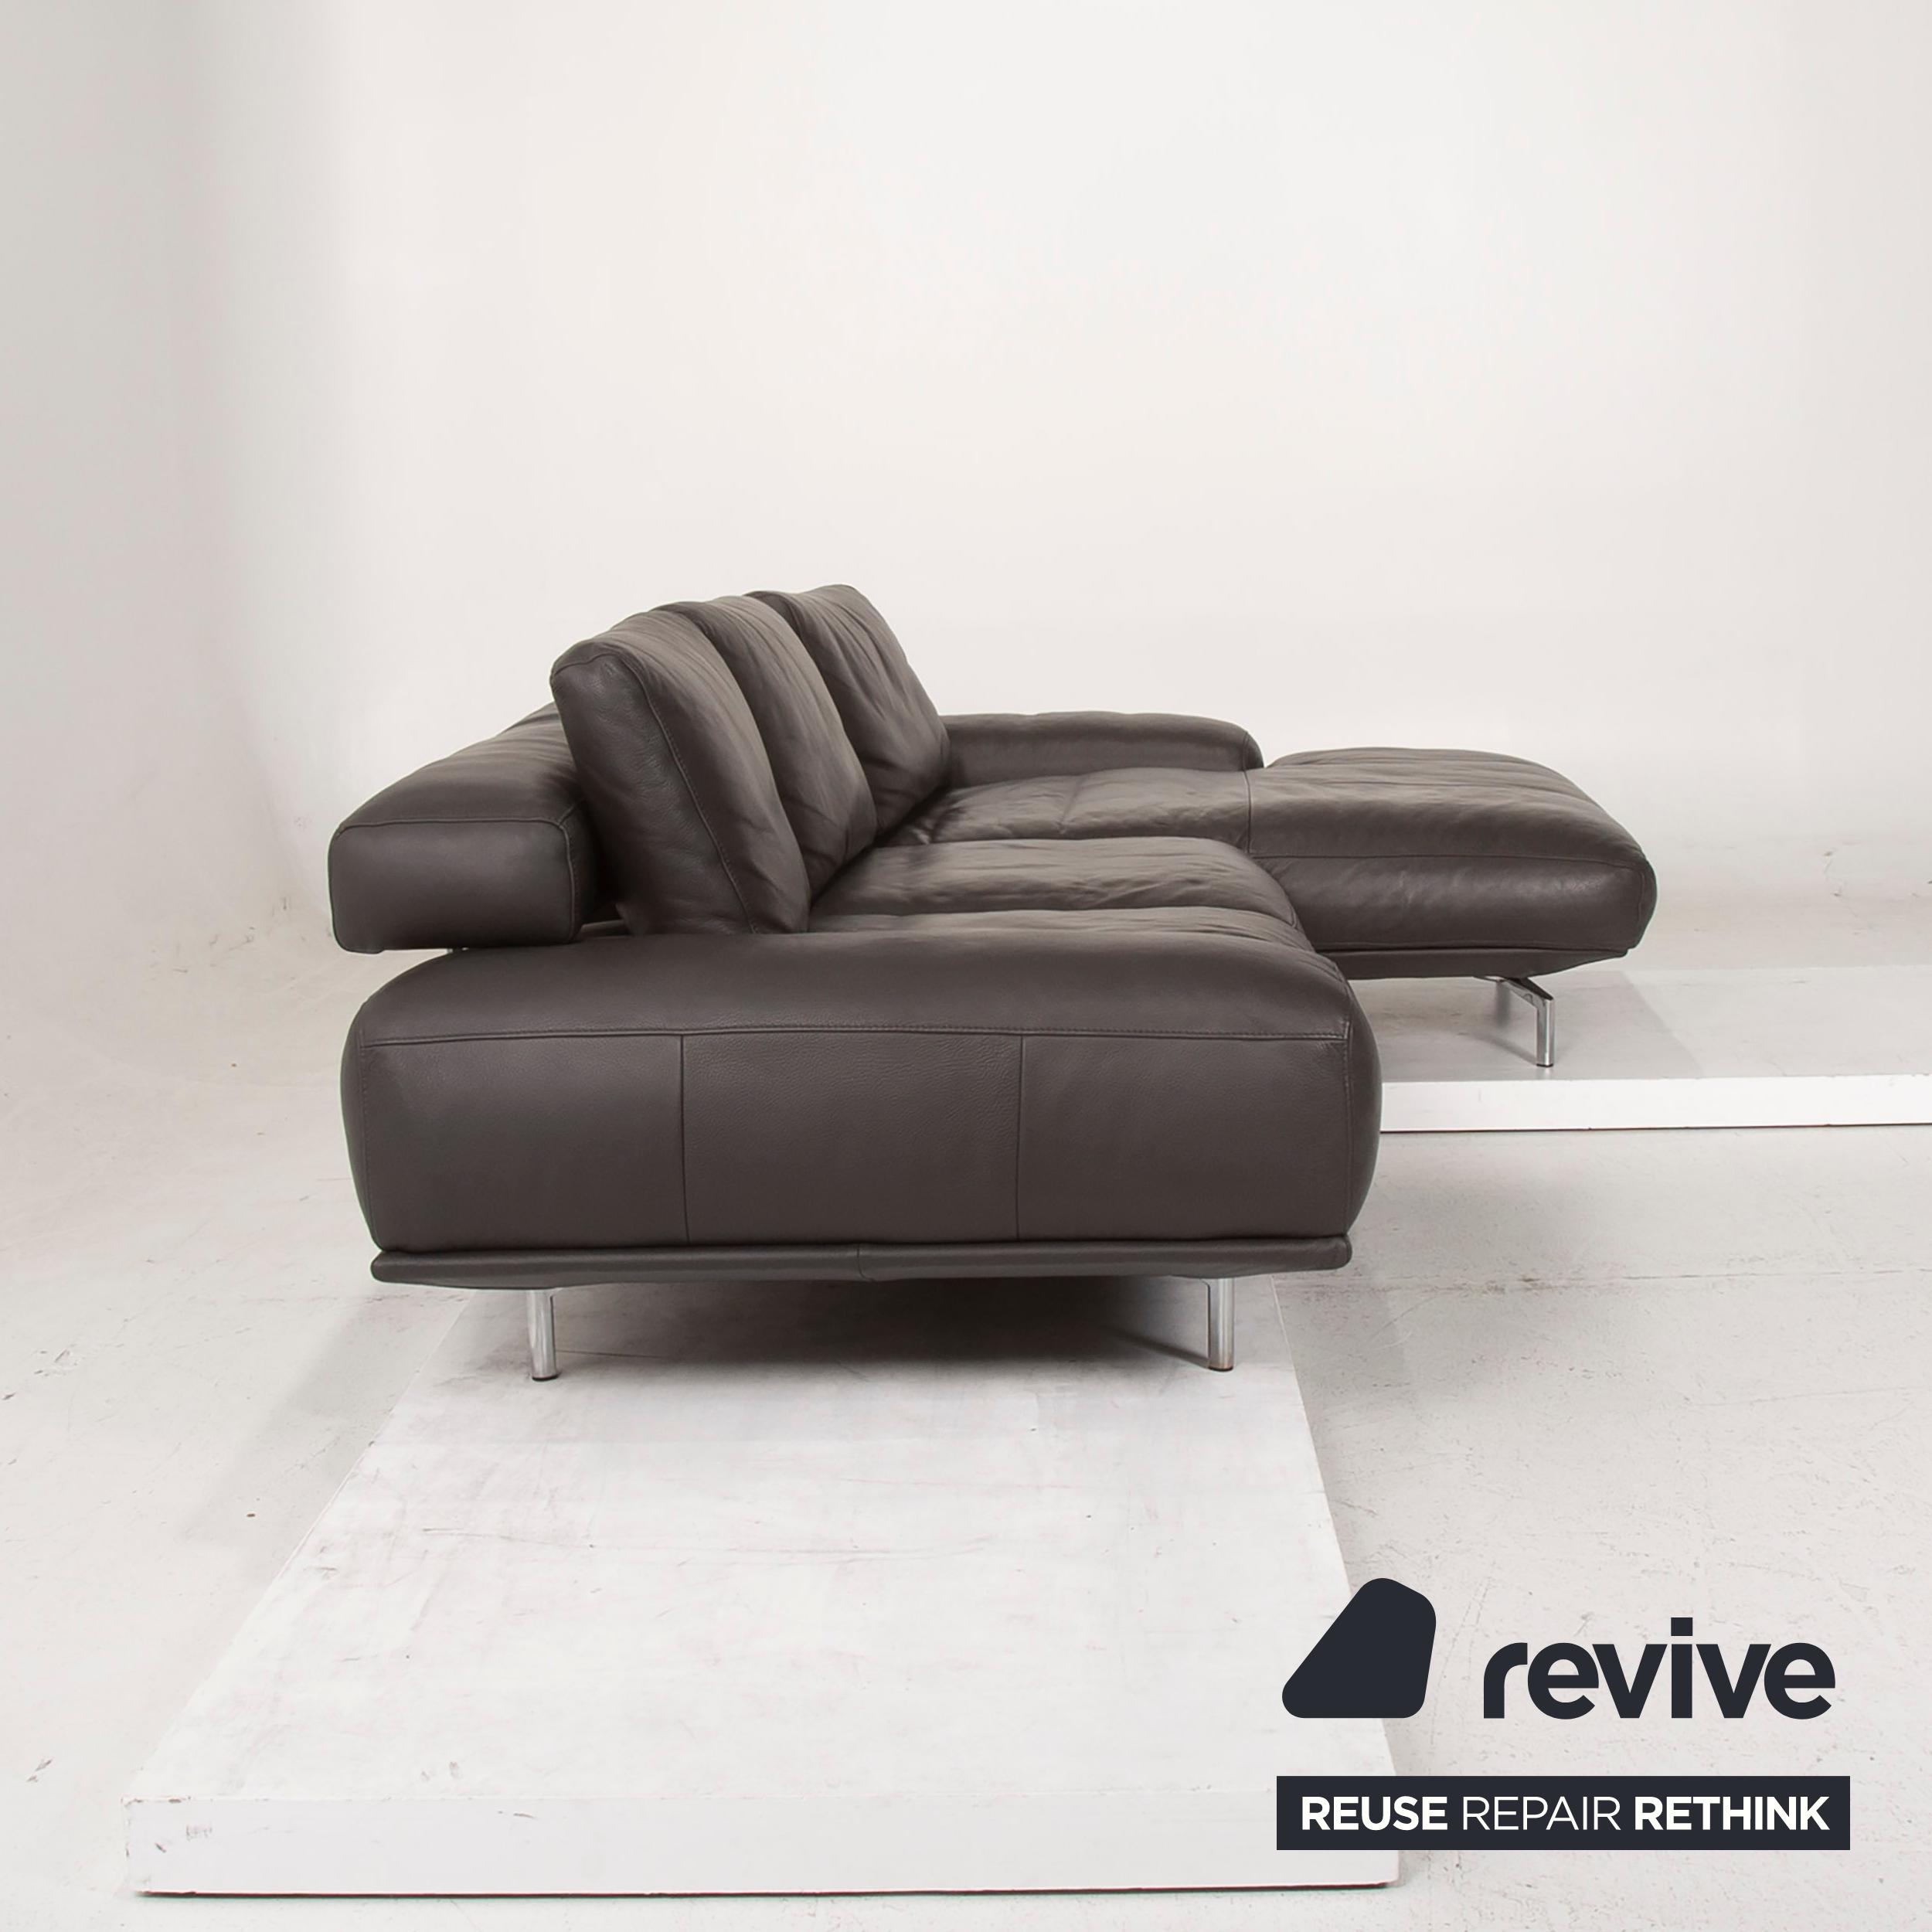 Ewald Schillig Brand Shine Leder Sofa Grau Ecksofa Elektrische Funktion Outlet Ebay